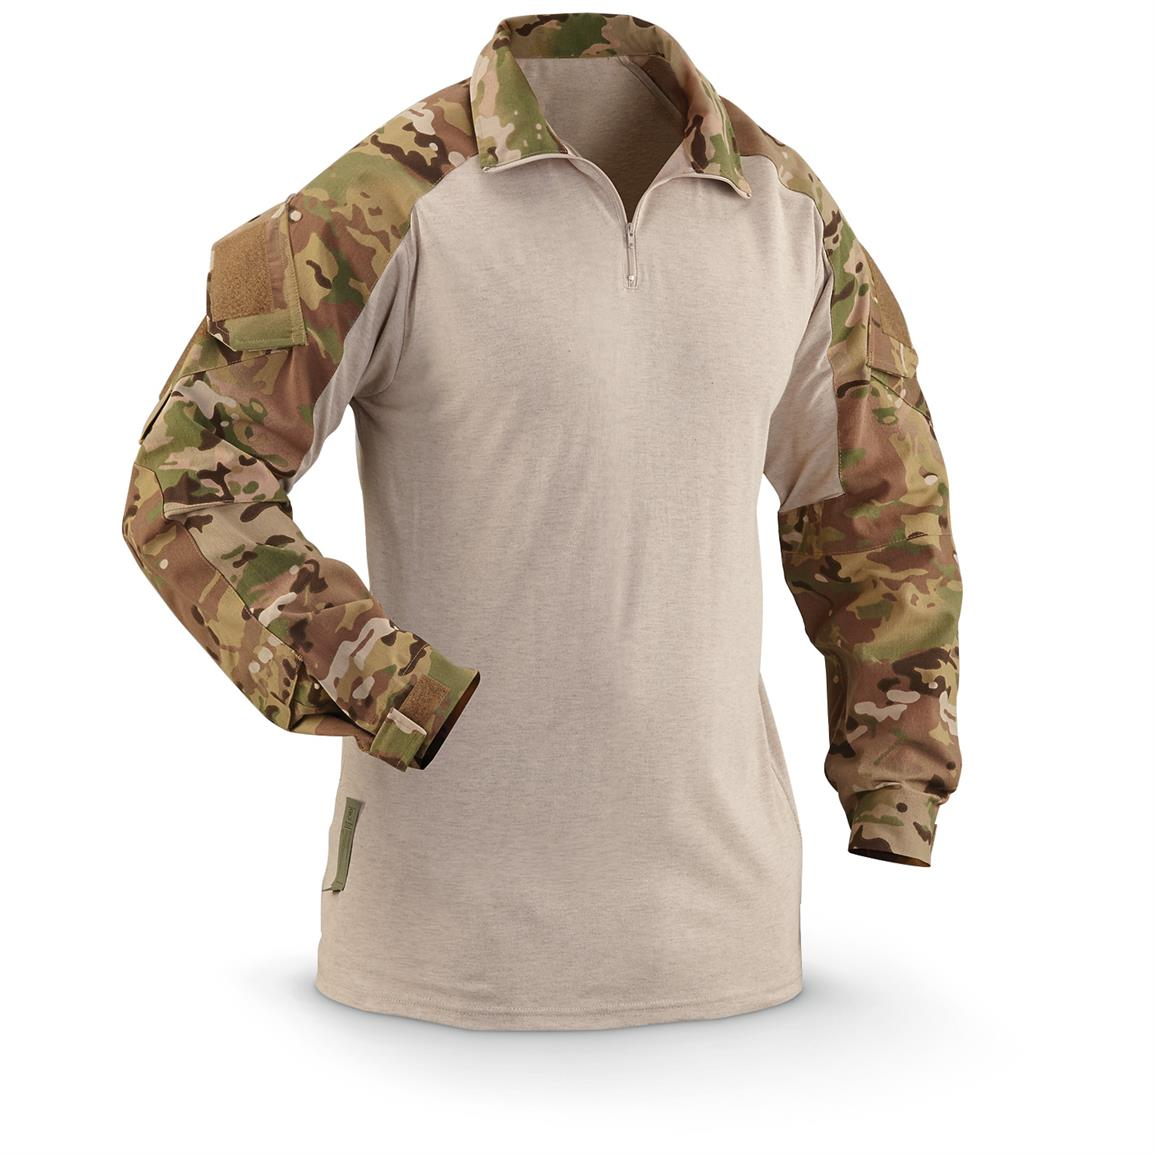 drifire-crye-combat-shirt-multicam.jpg